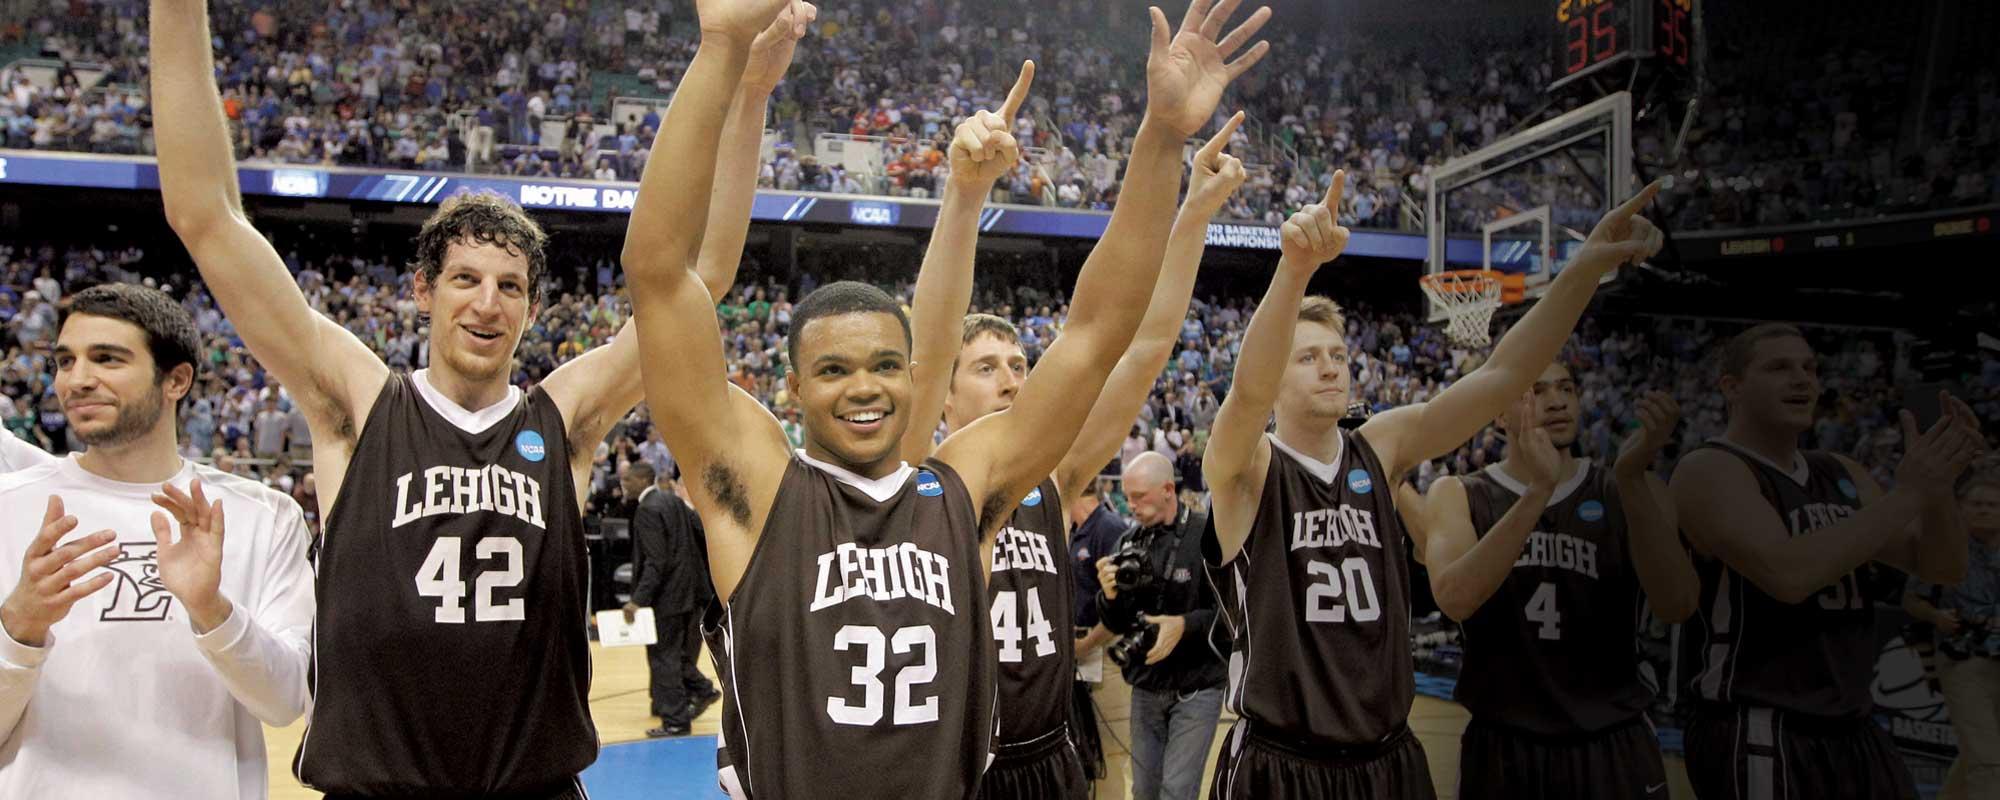 Lehigh basketball team after beating Duke